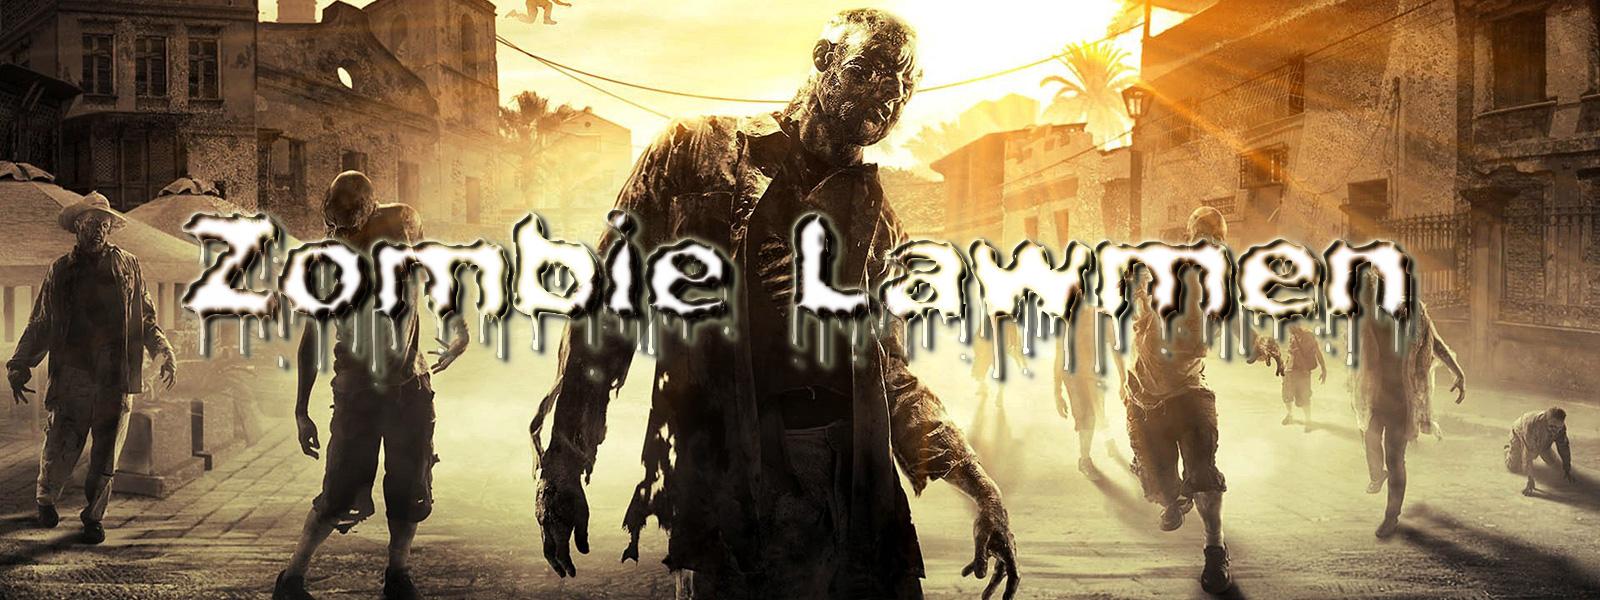 Zombie Lawmen